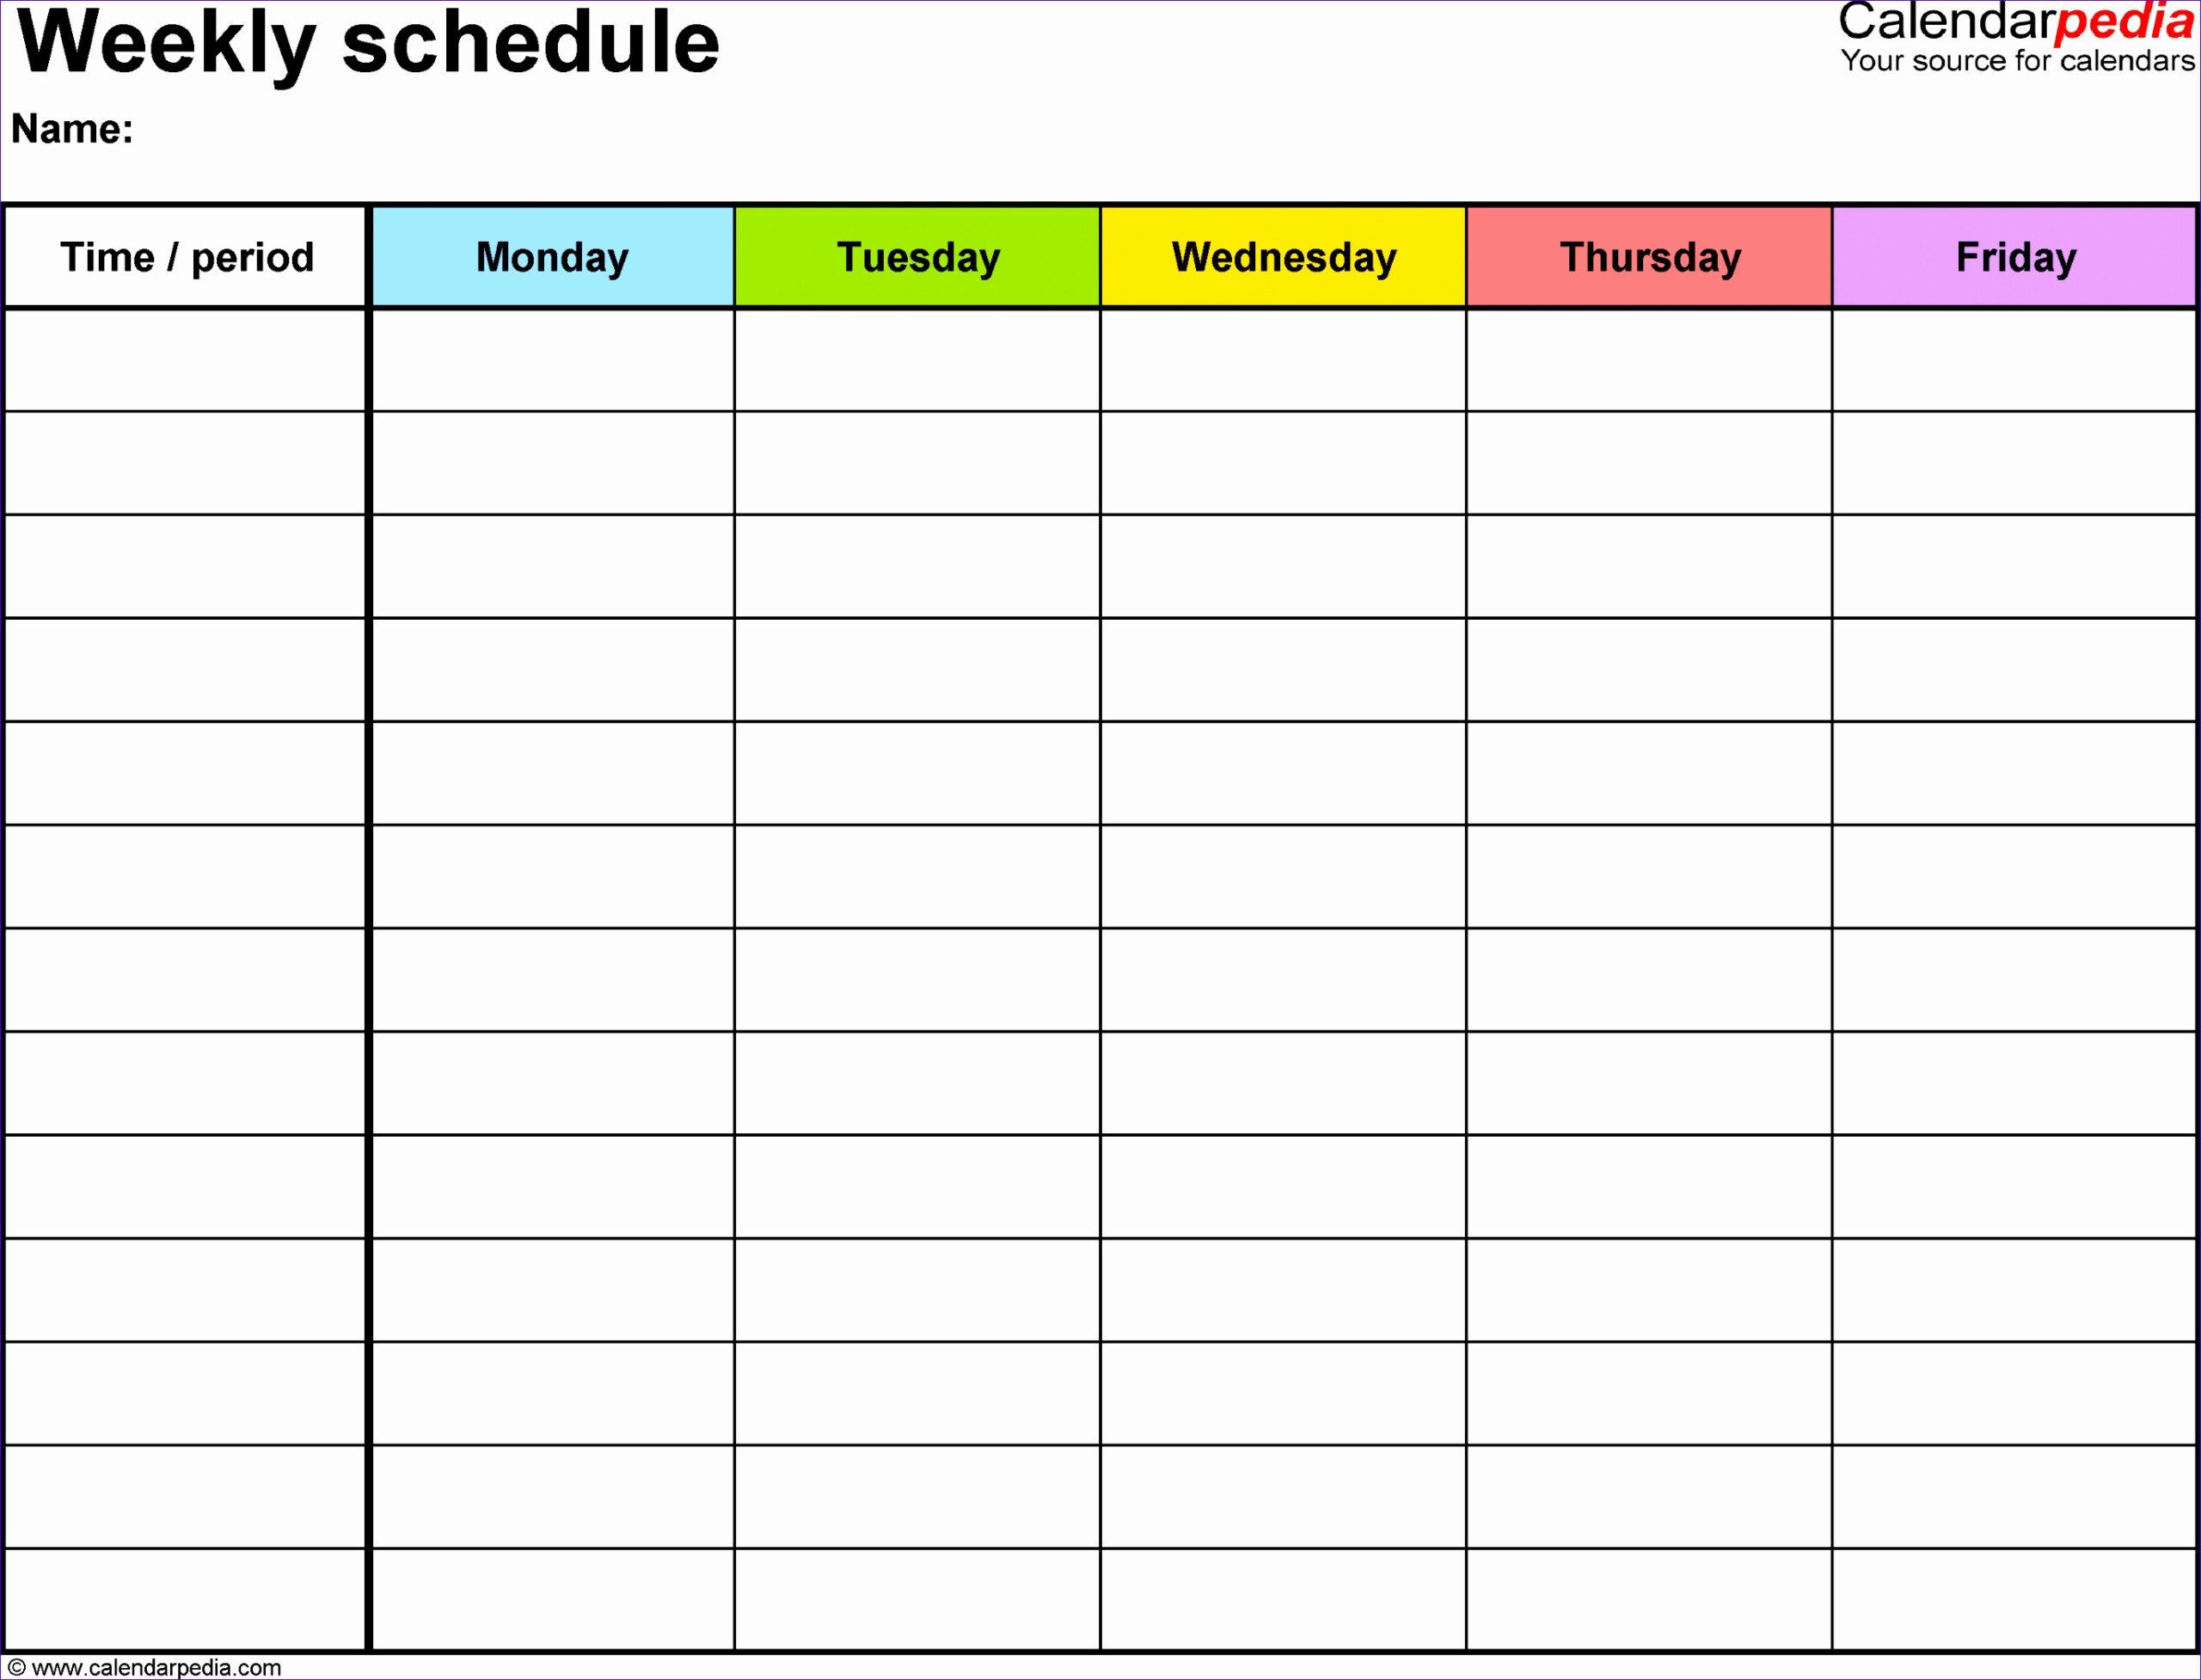 8 Hourly Gantt Chart Excel Template  Excel Templates  Excel Templates inside 5 Day Calendar Template